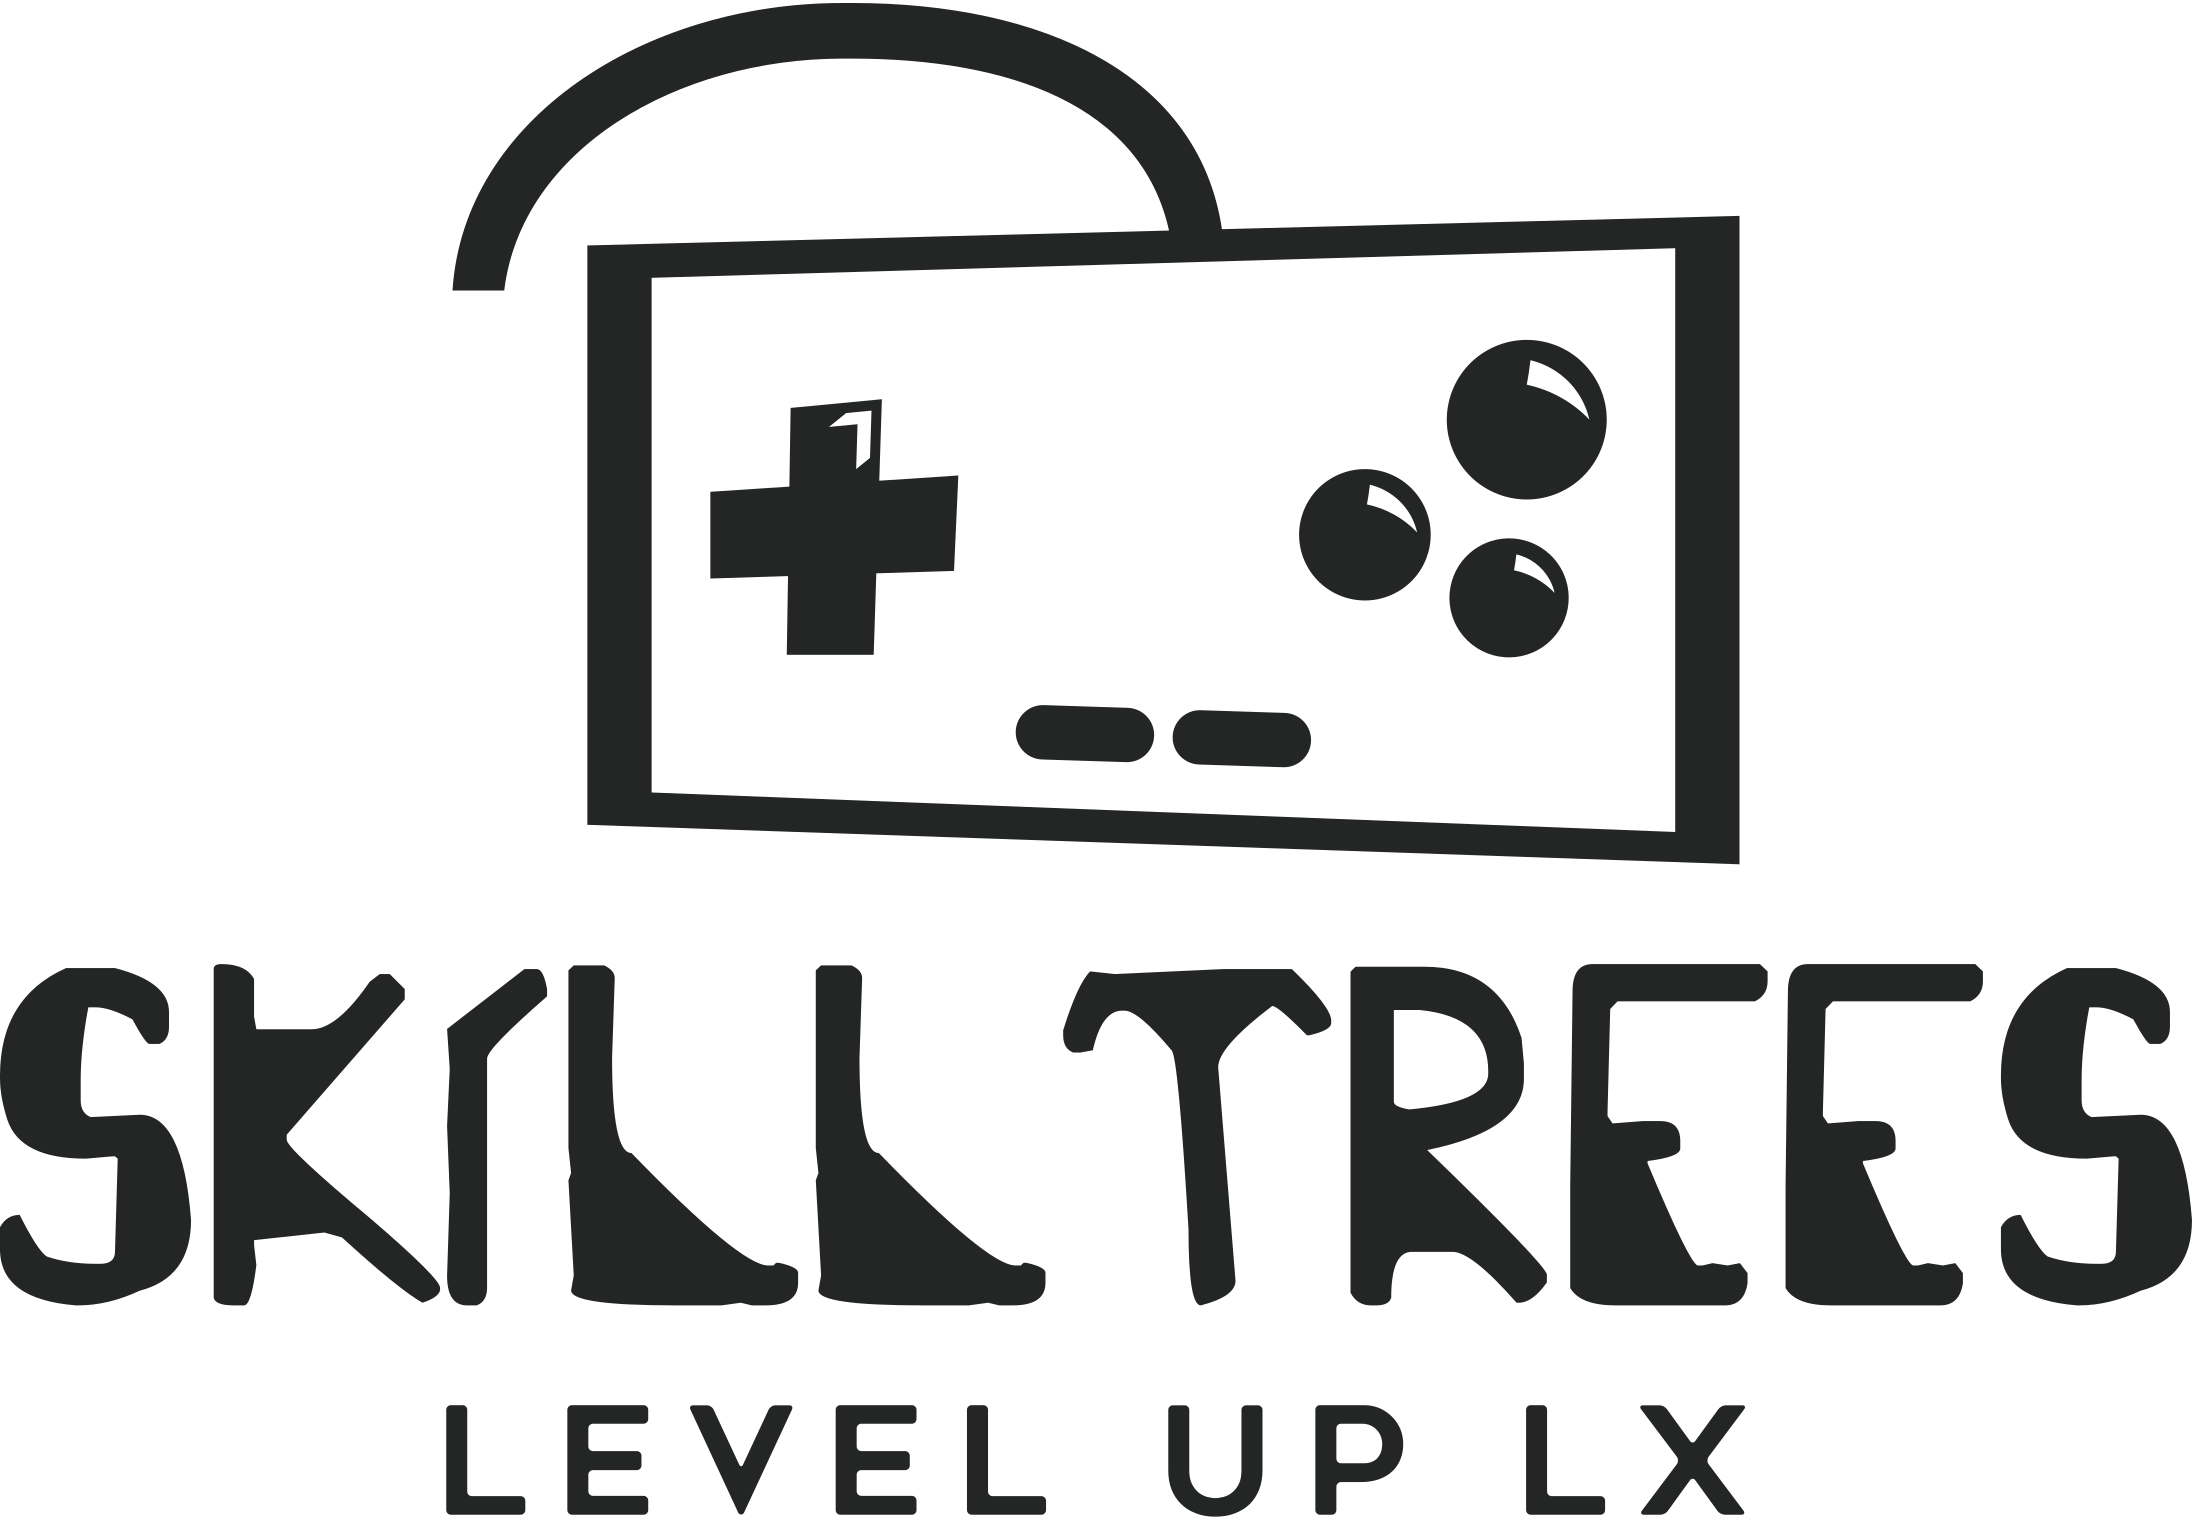 SkillTrees